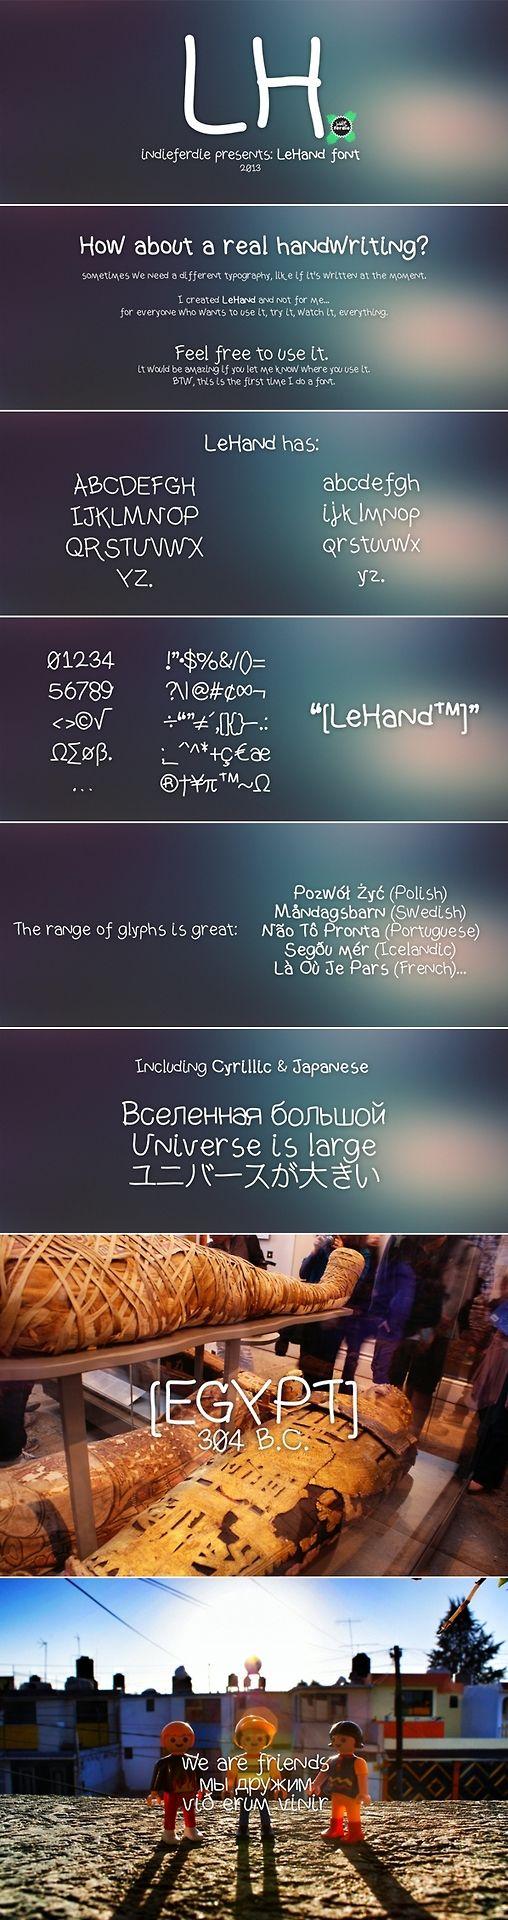 LeHand - Free Font